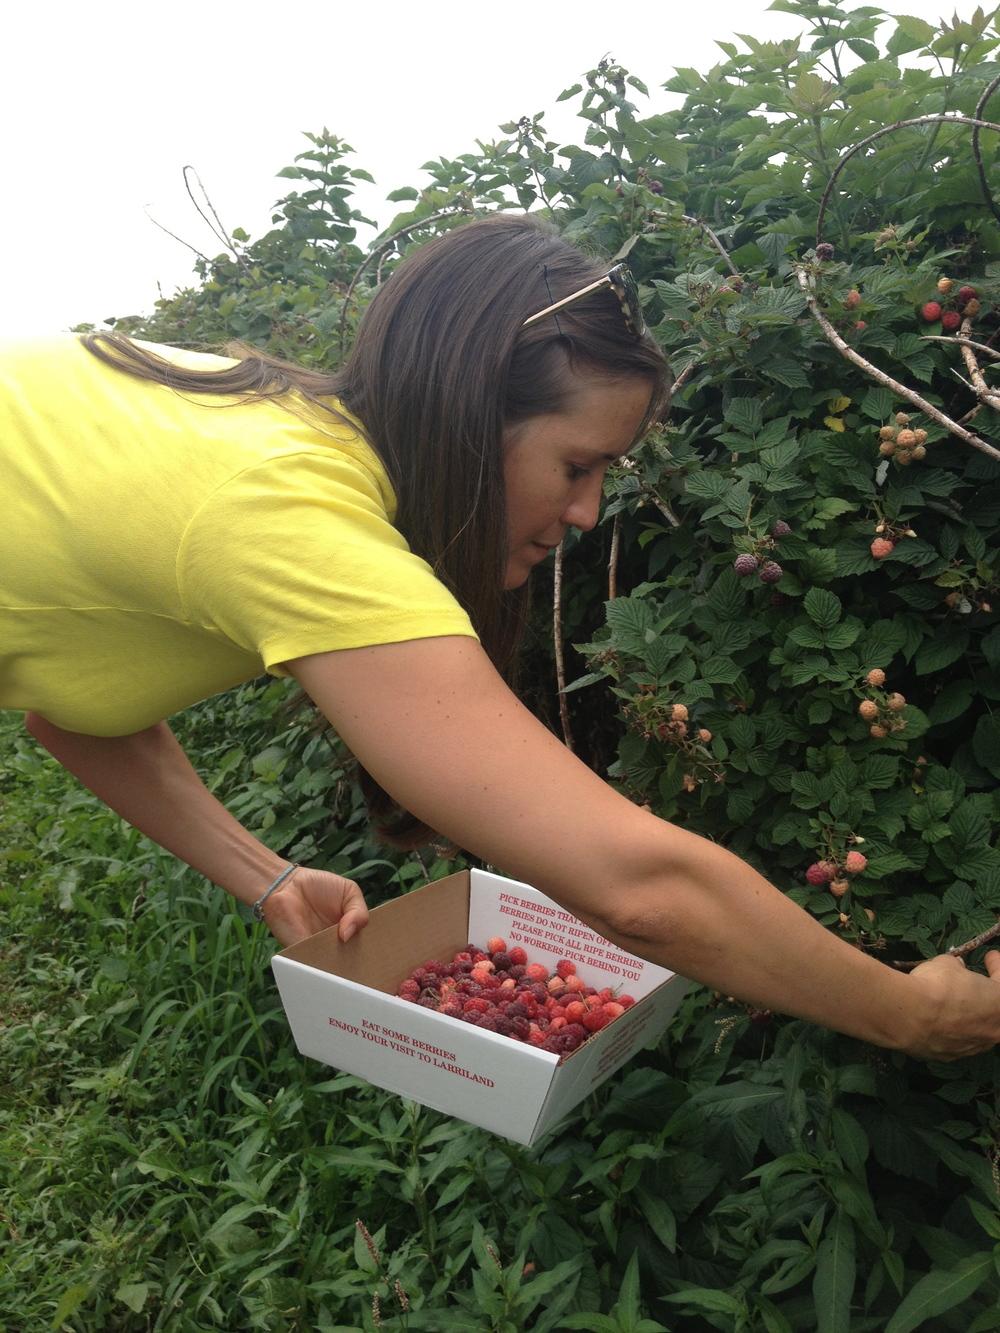 Hilary picking raspberries